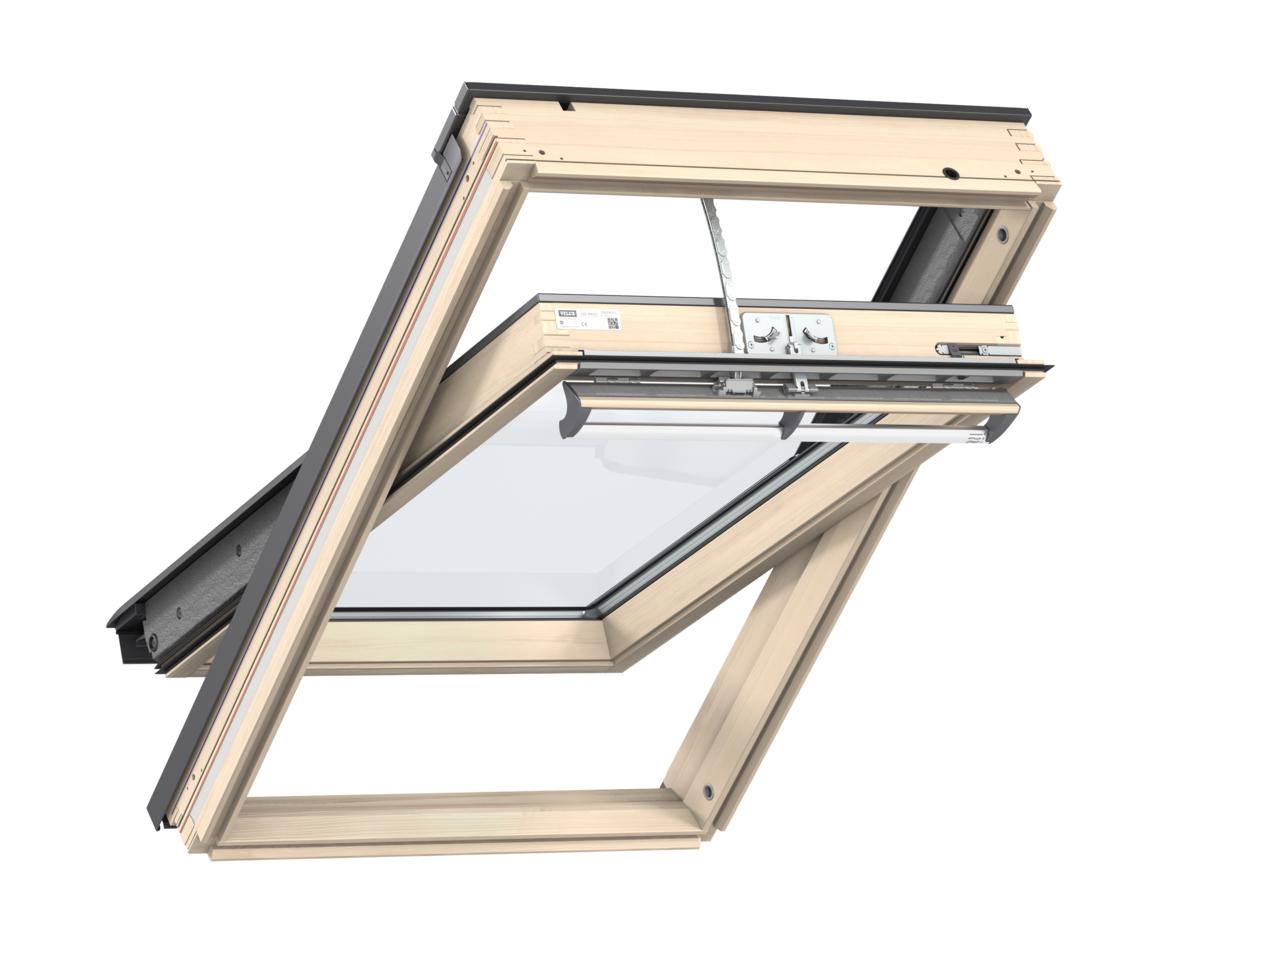 dachfenster velux ggl 3066 integra. Black Bedroom Furniture Sets. Home Design Ideas